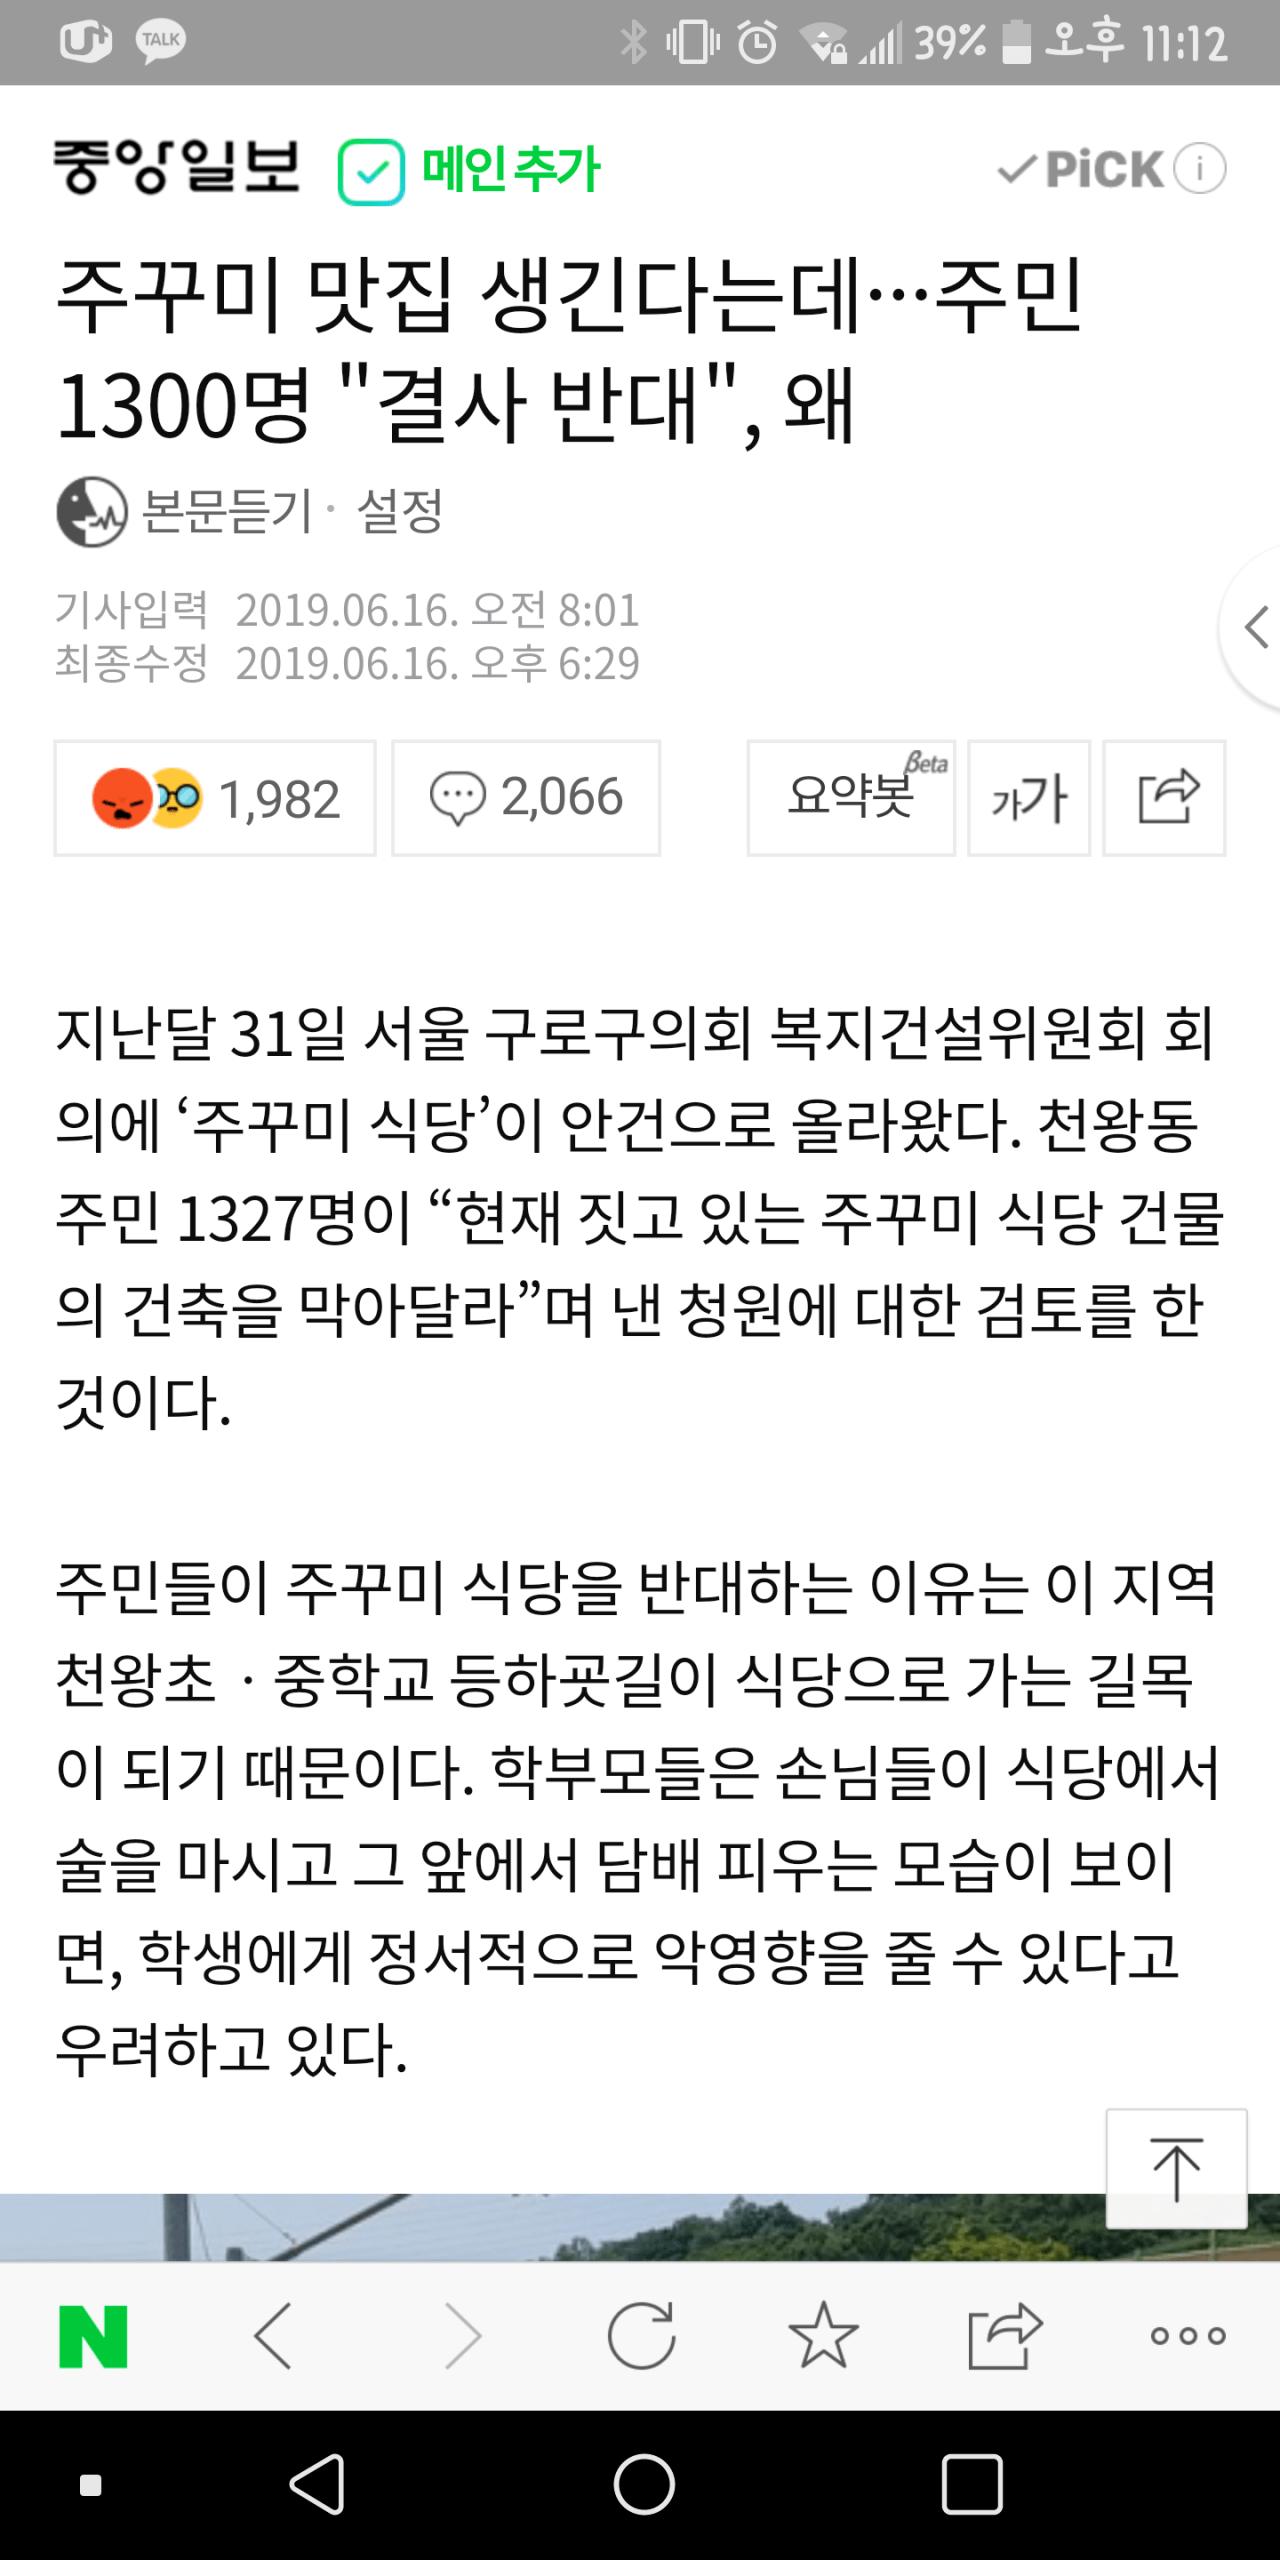 Screenshot_2019-06-16-23-12-20.png 구로구 주꾸미집 결사반대